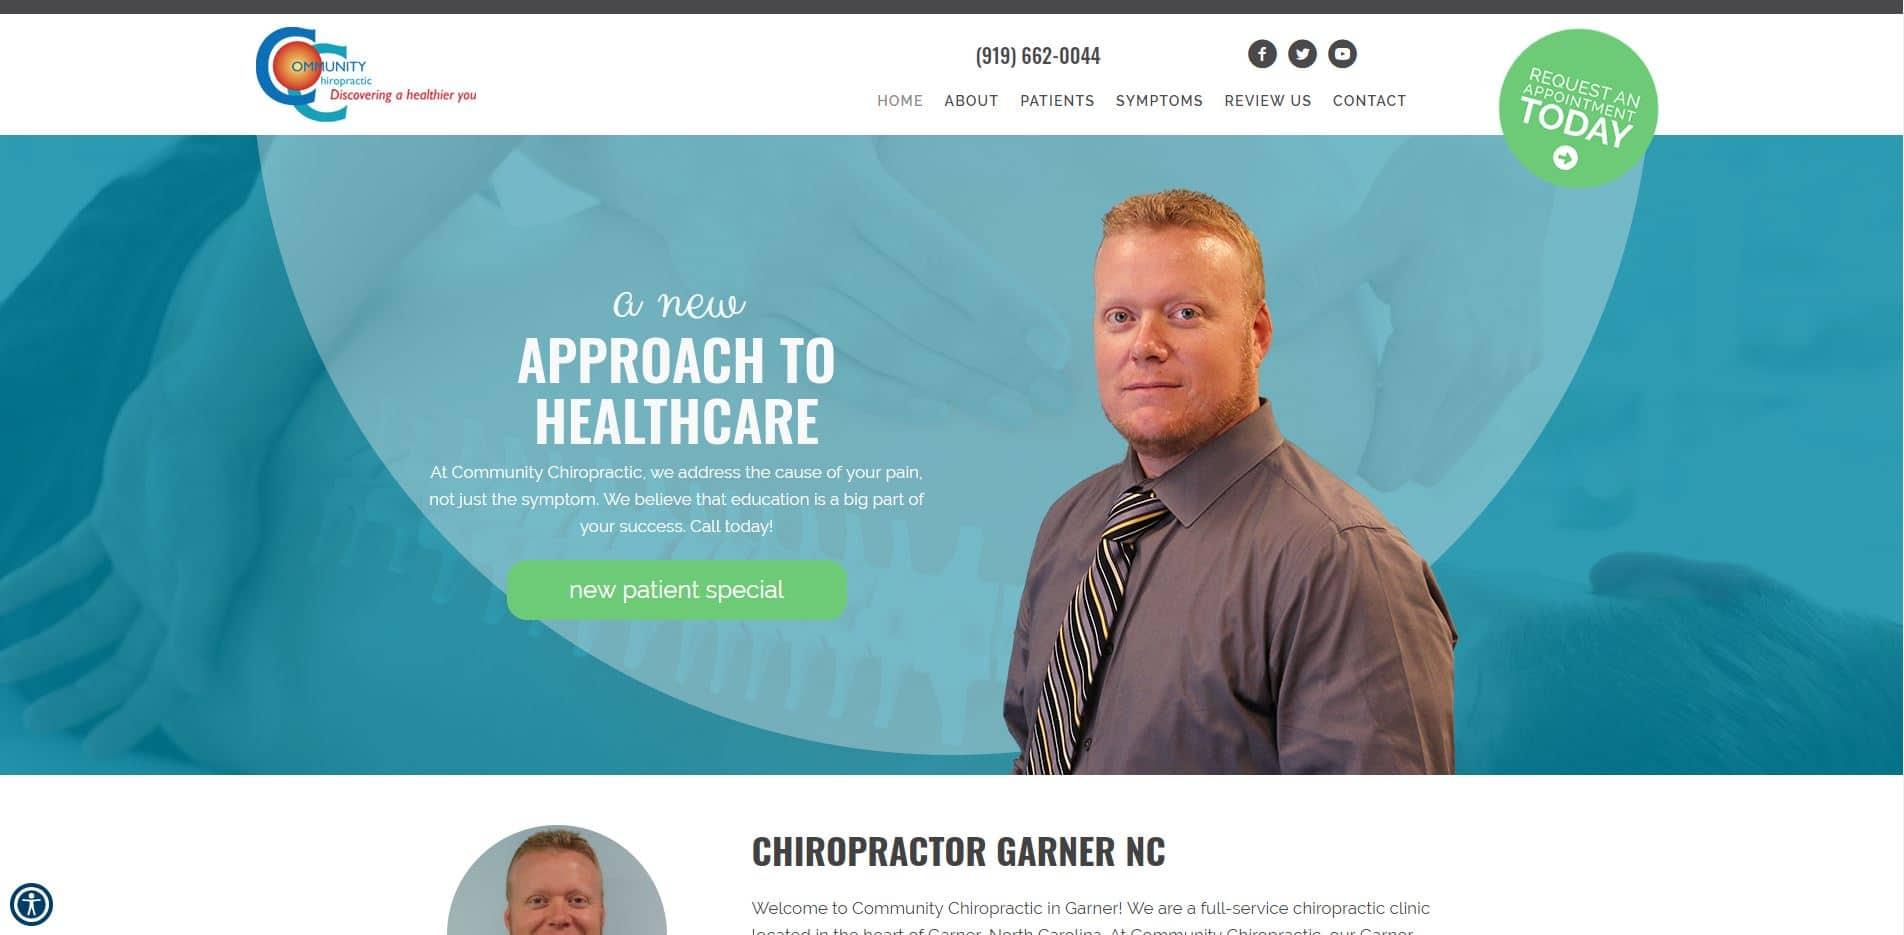 Chiropractor in Garner